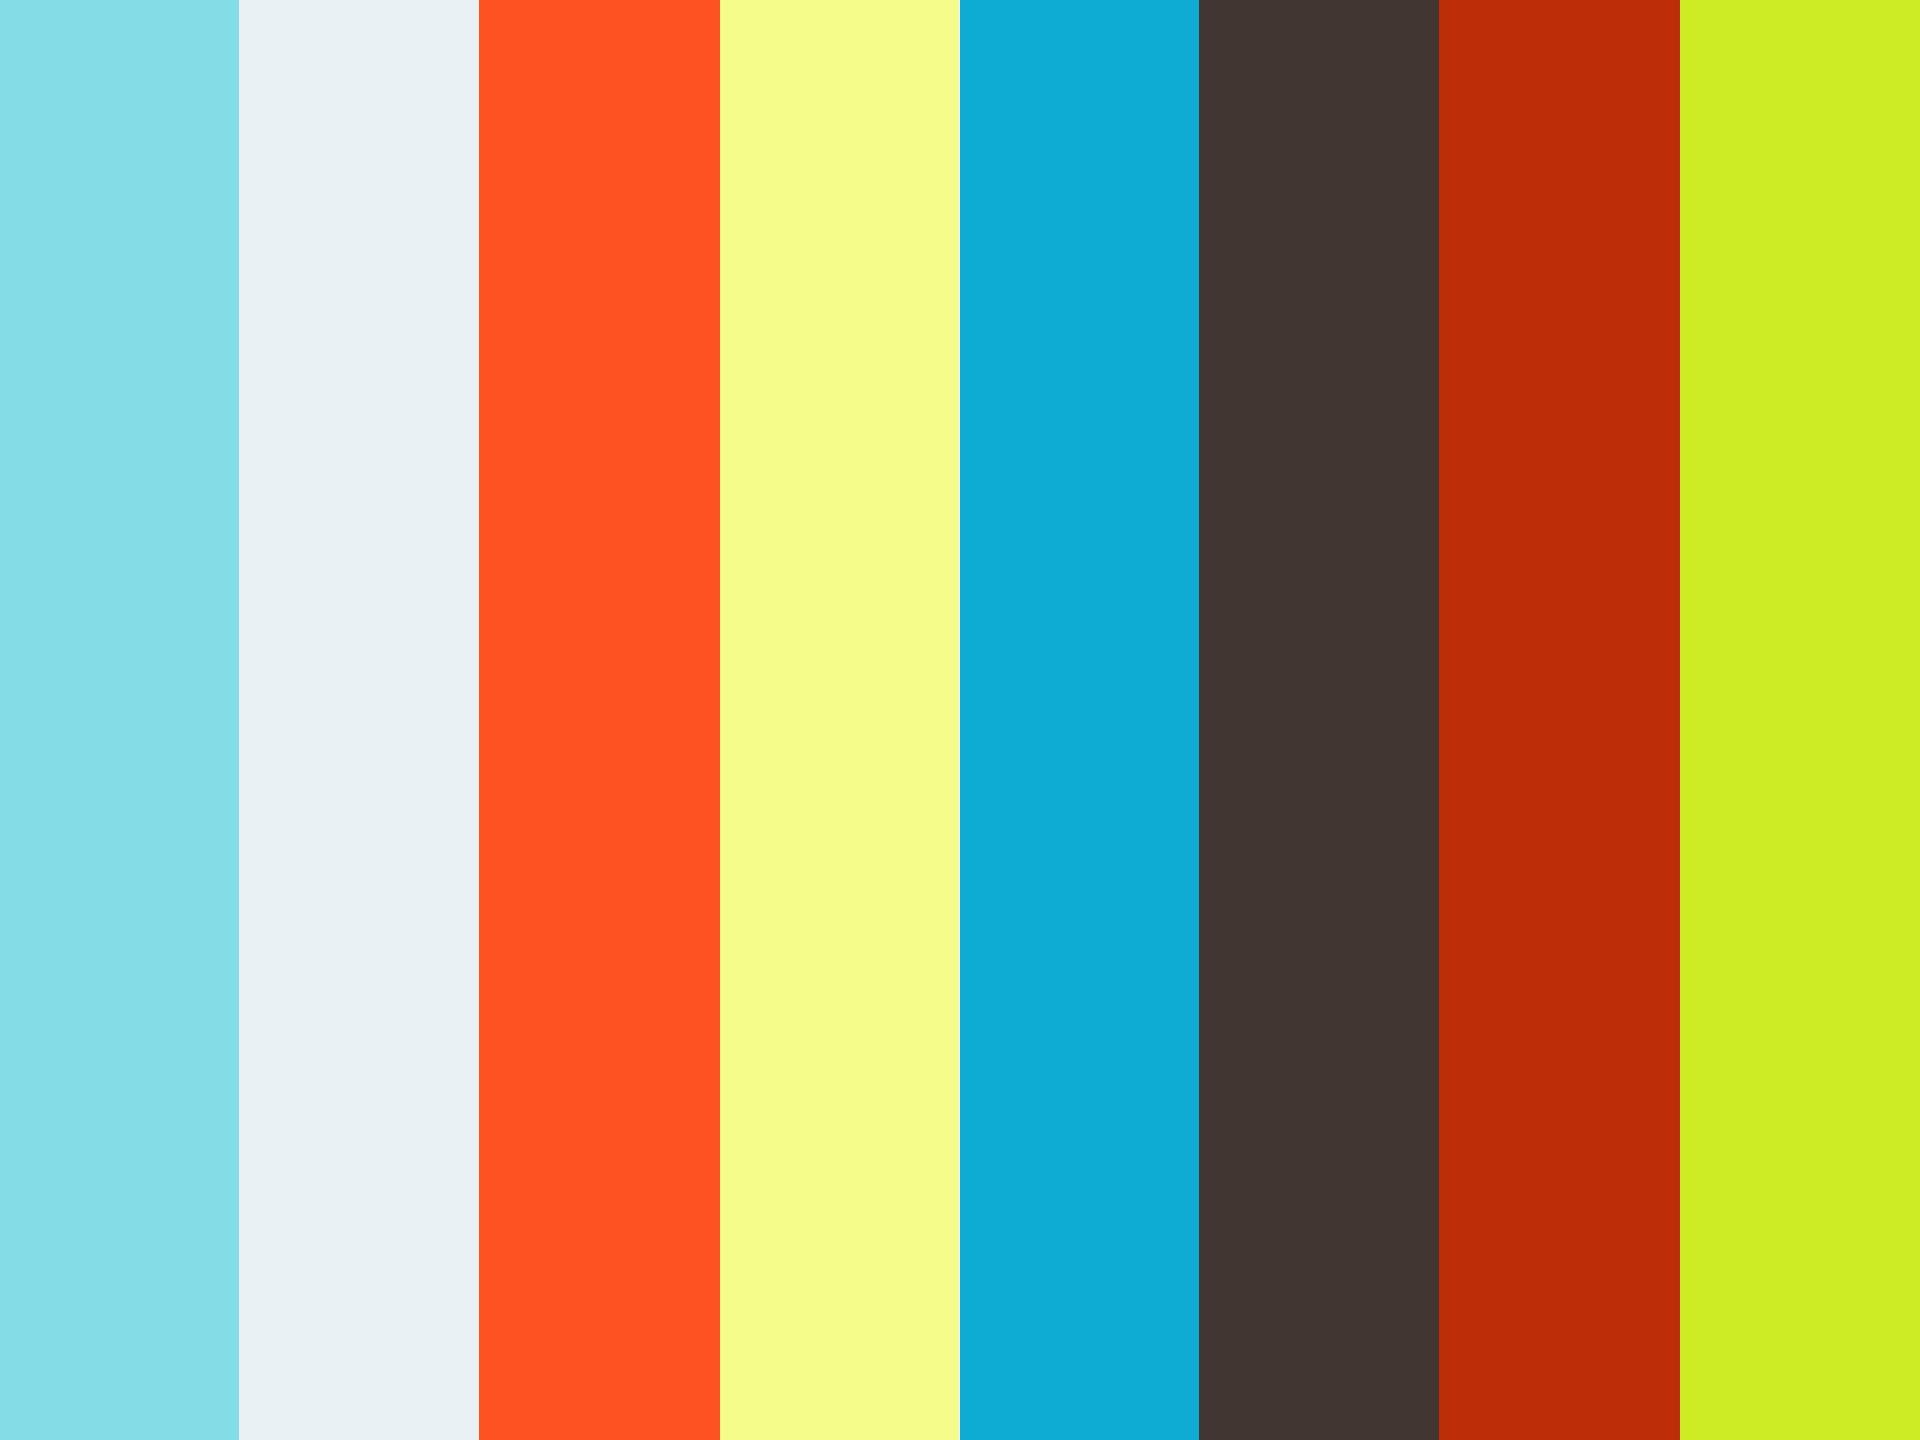 Color Digital GmbH